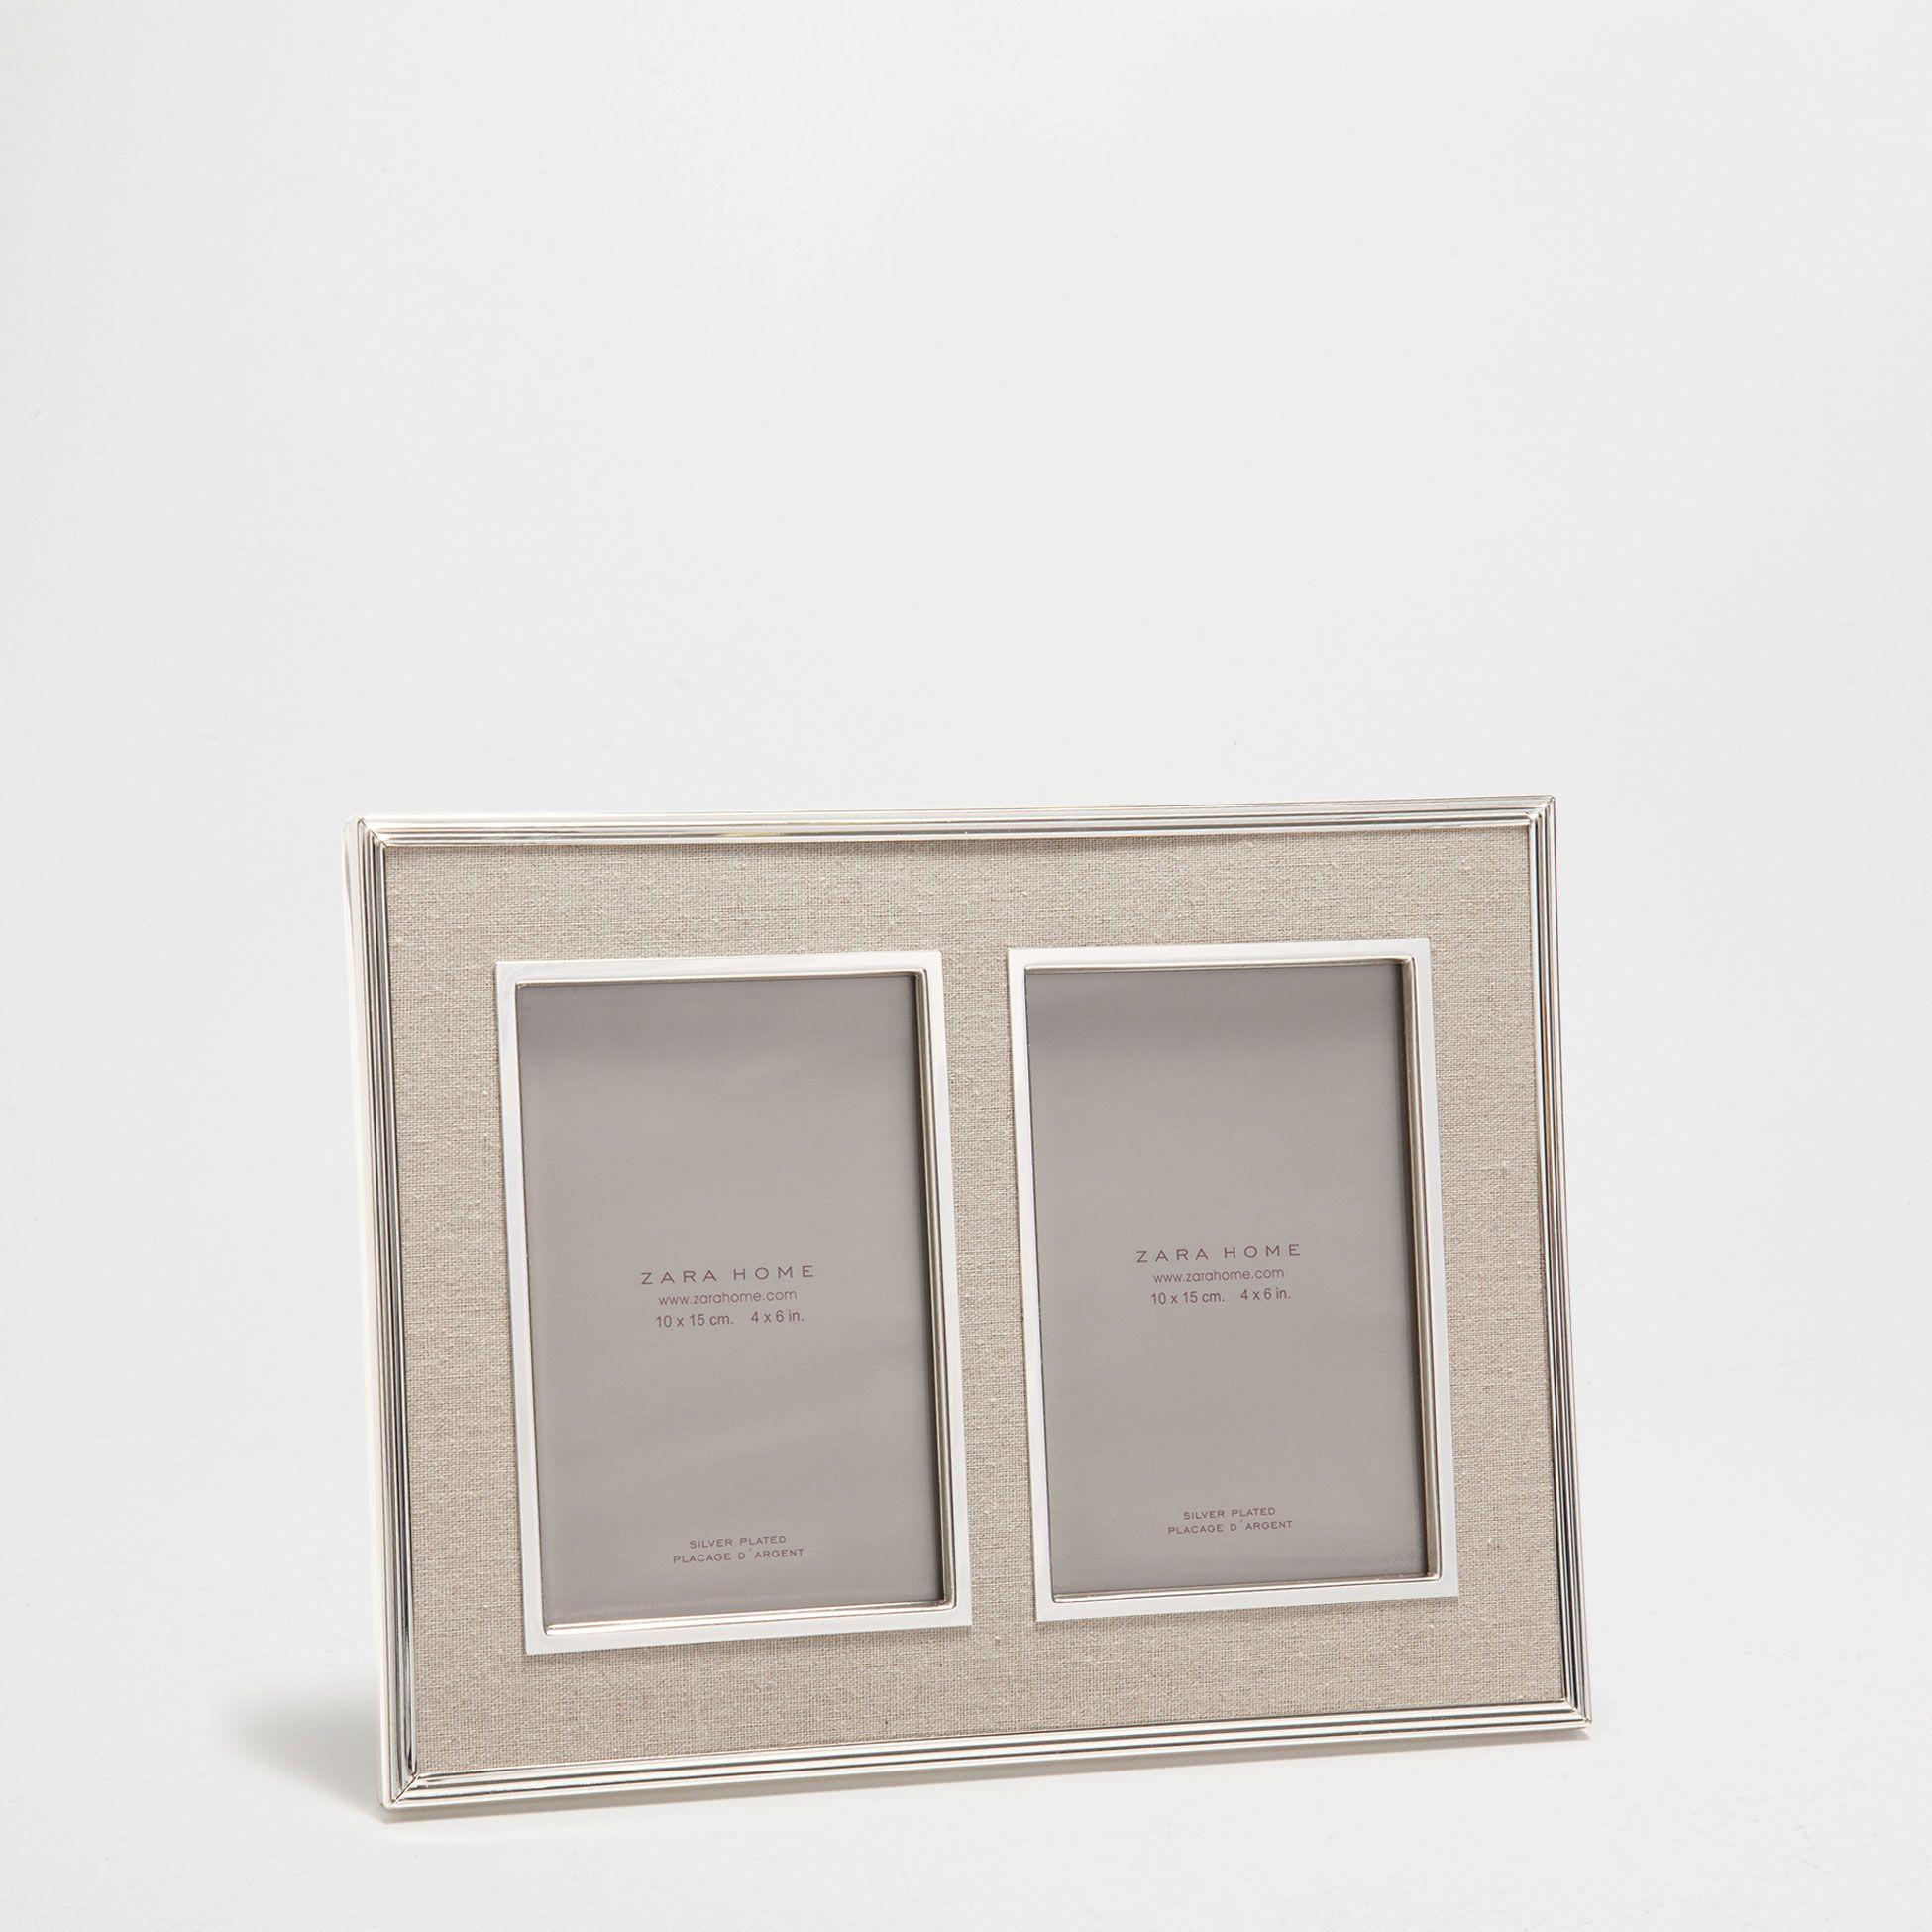 Marco doble metal y lino - Novedades | Zara Home España | Home ...